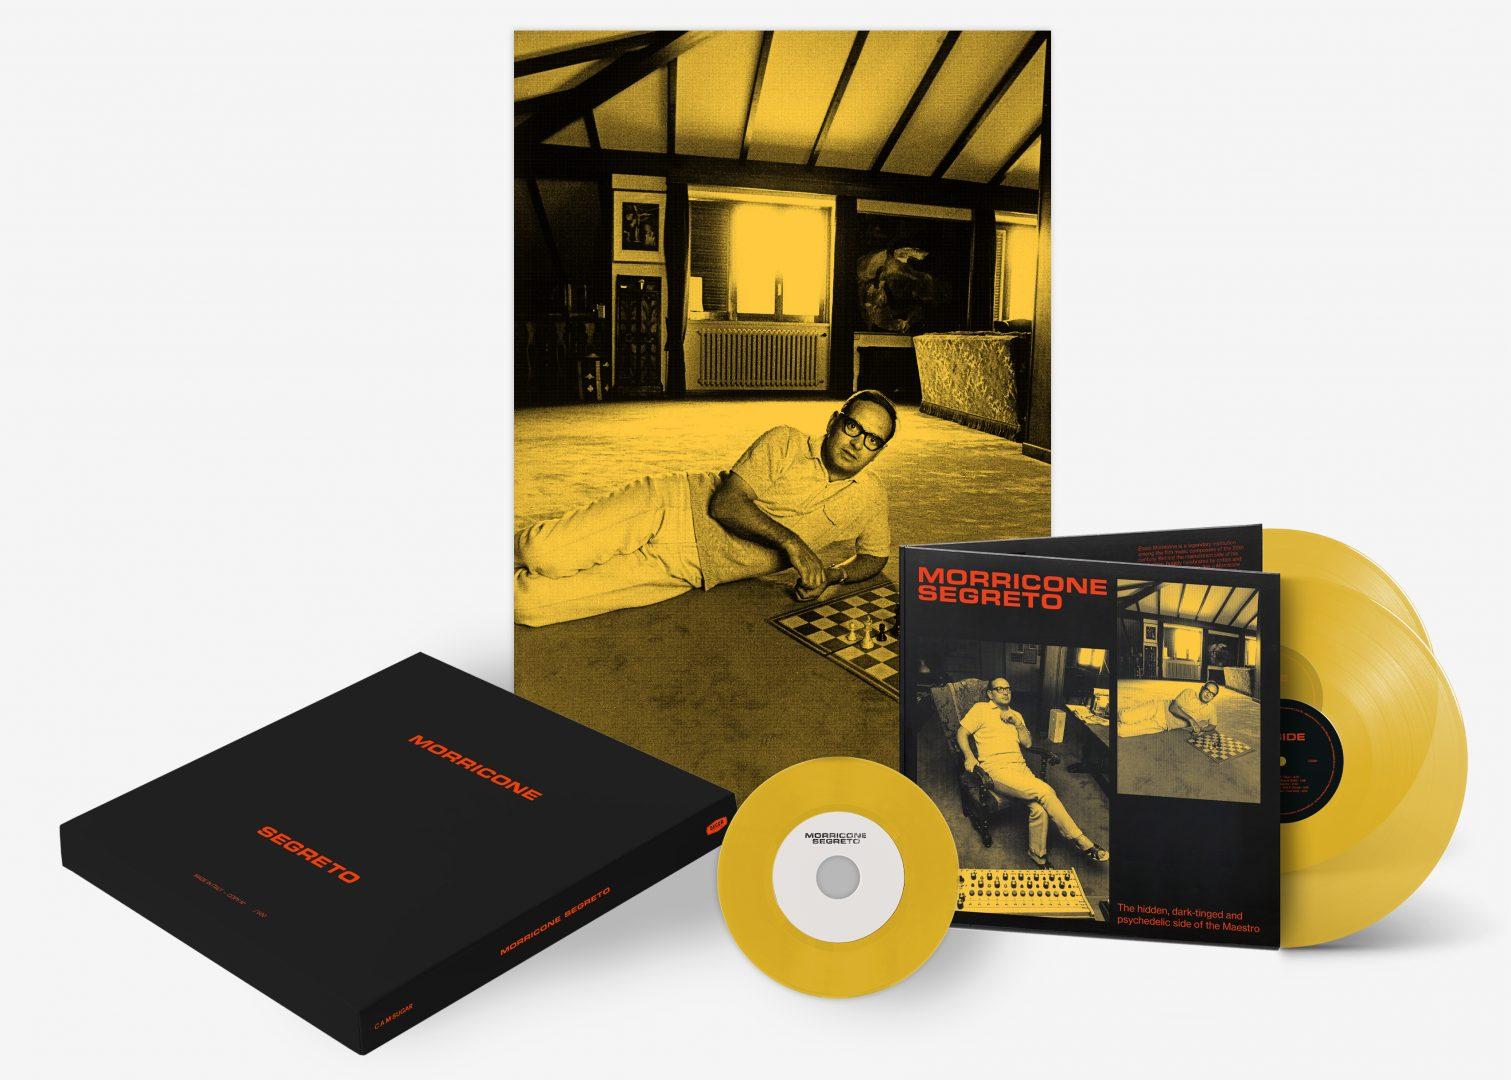 Morricone Segreto, Double LP, CD, Collectors Edition. Photography by Luciano Viti's Archive